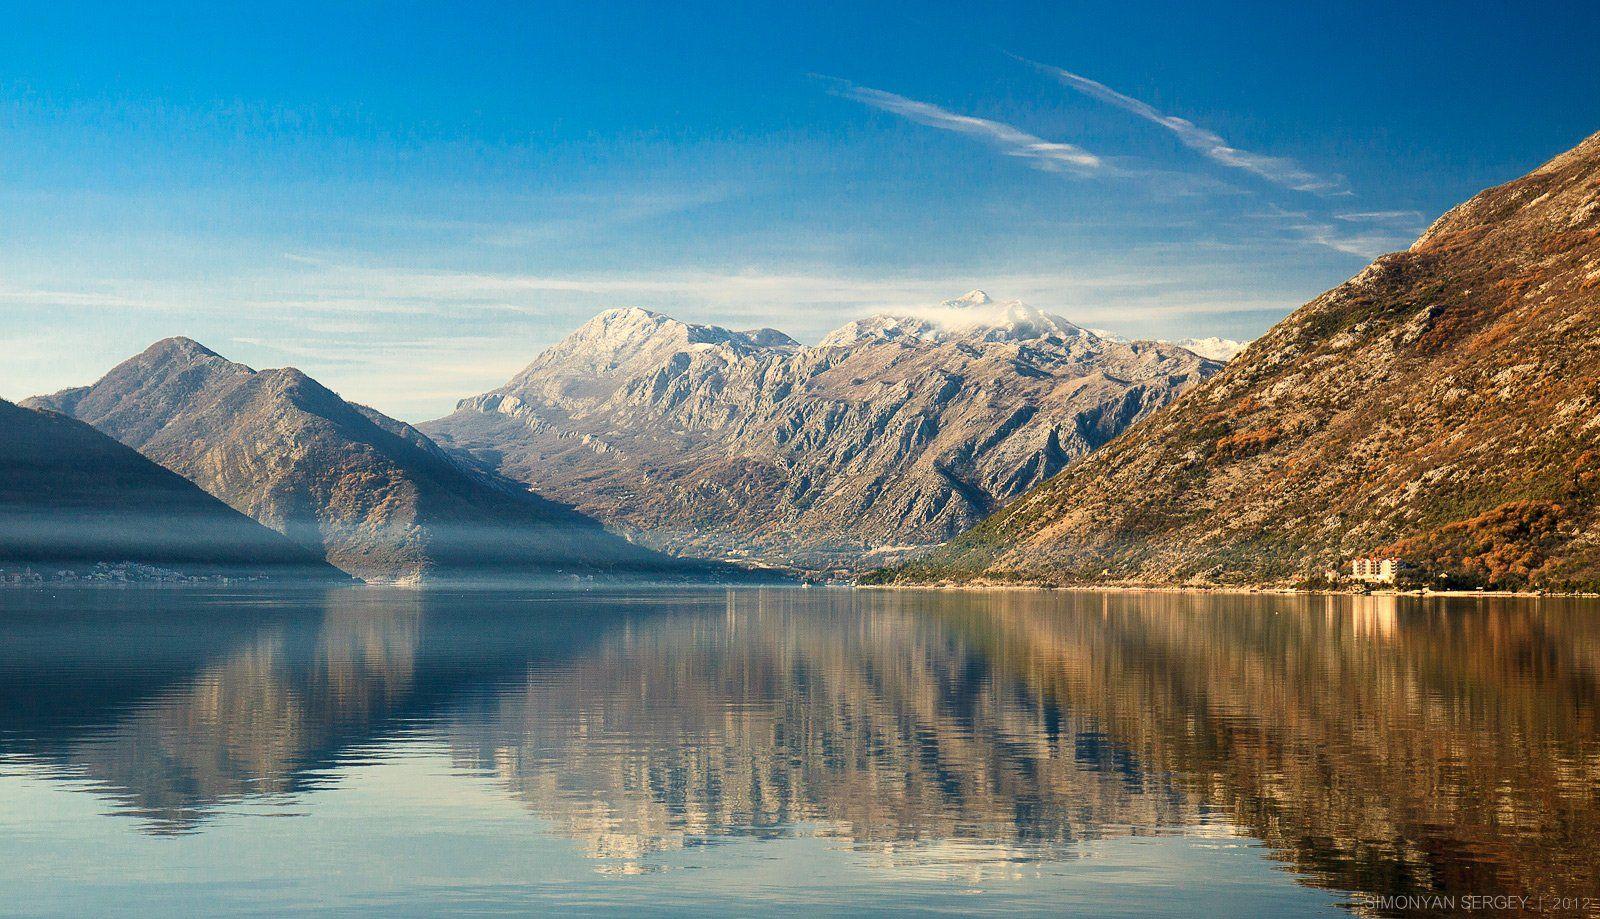 Горы, Европа, Море, Облака, Снег, Черногория, Симонян Сергей